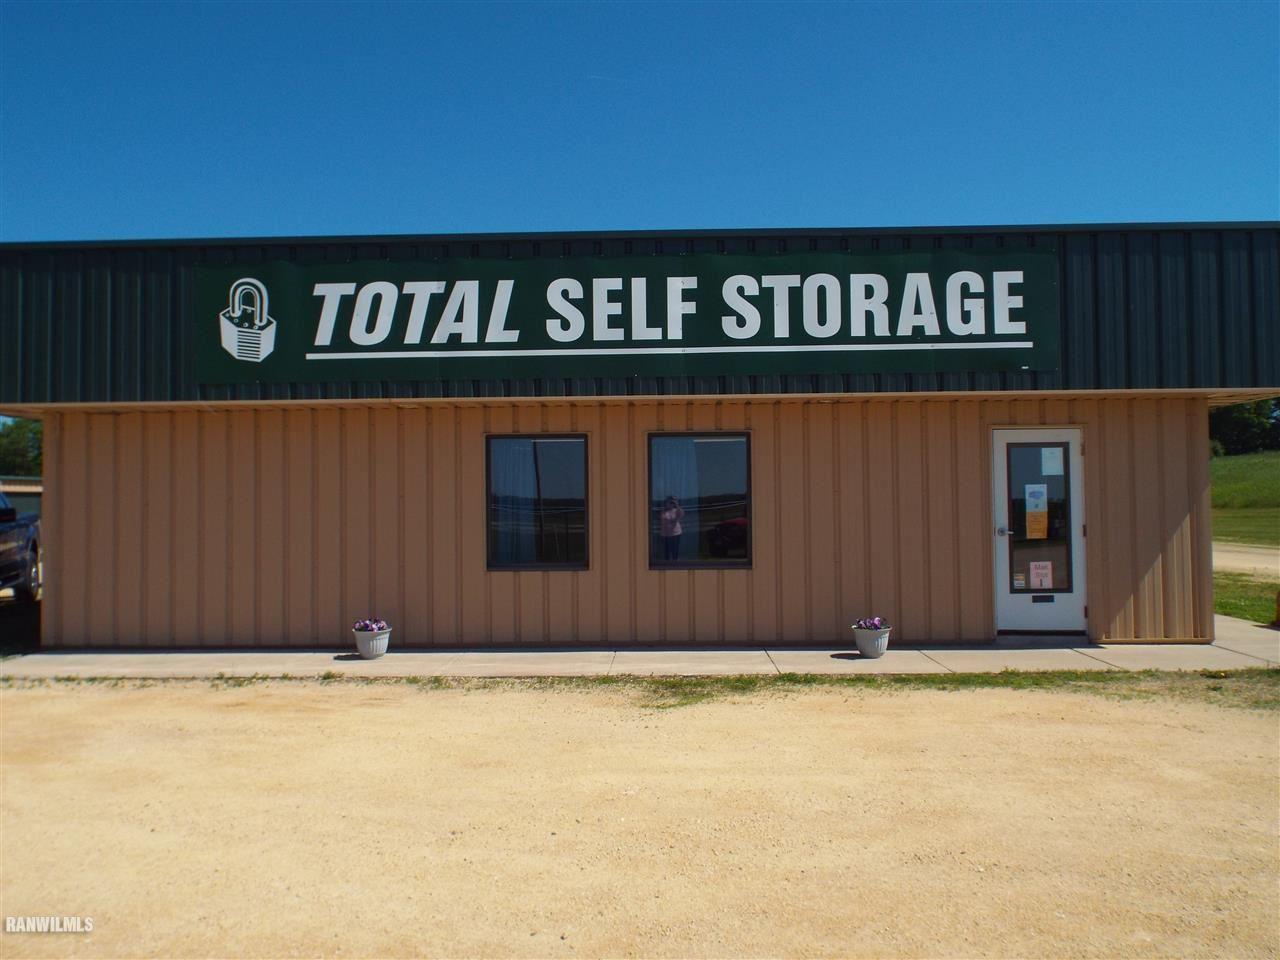 Image of Acreage for Sale near Freeport, Illinois, in Stephenson county: 14.30 acres